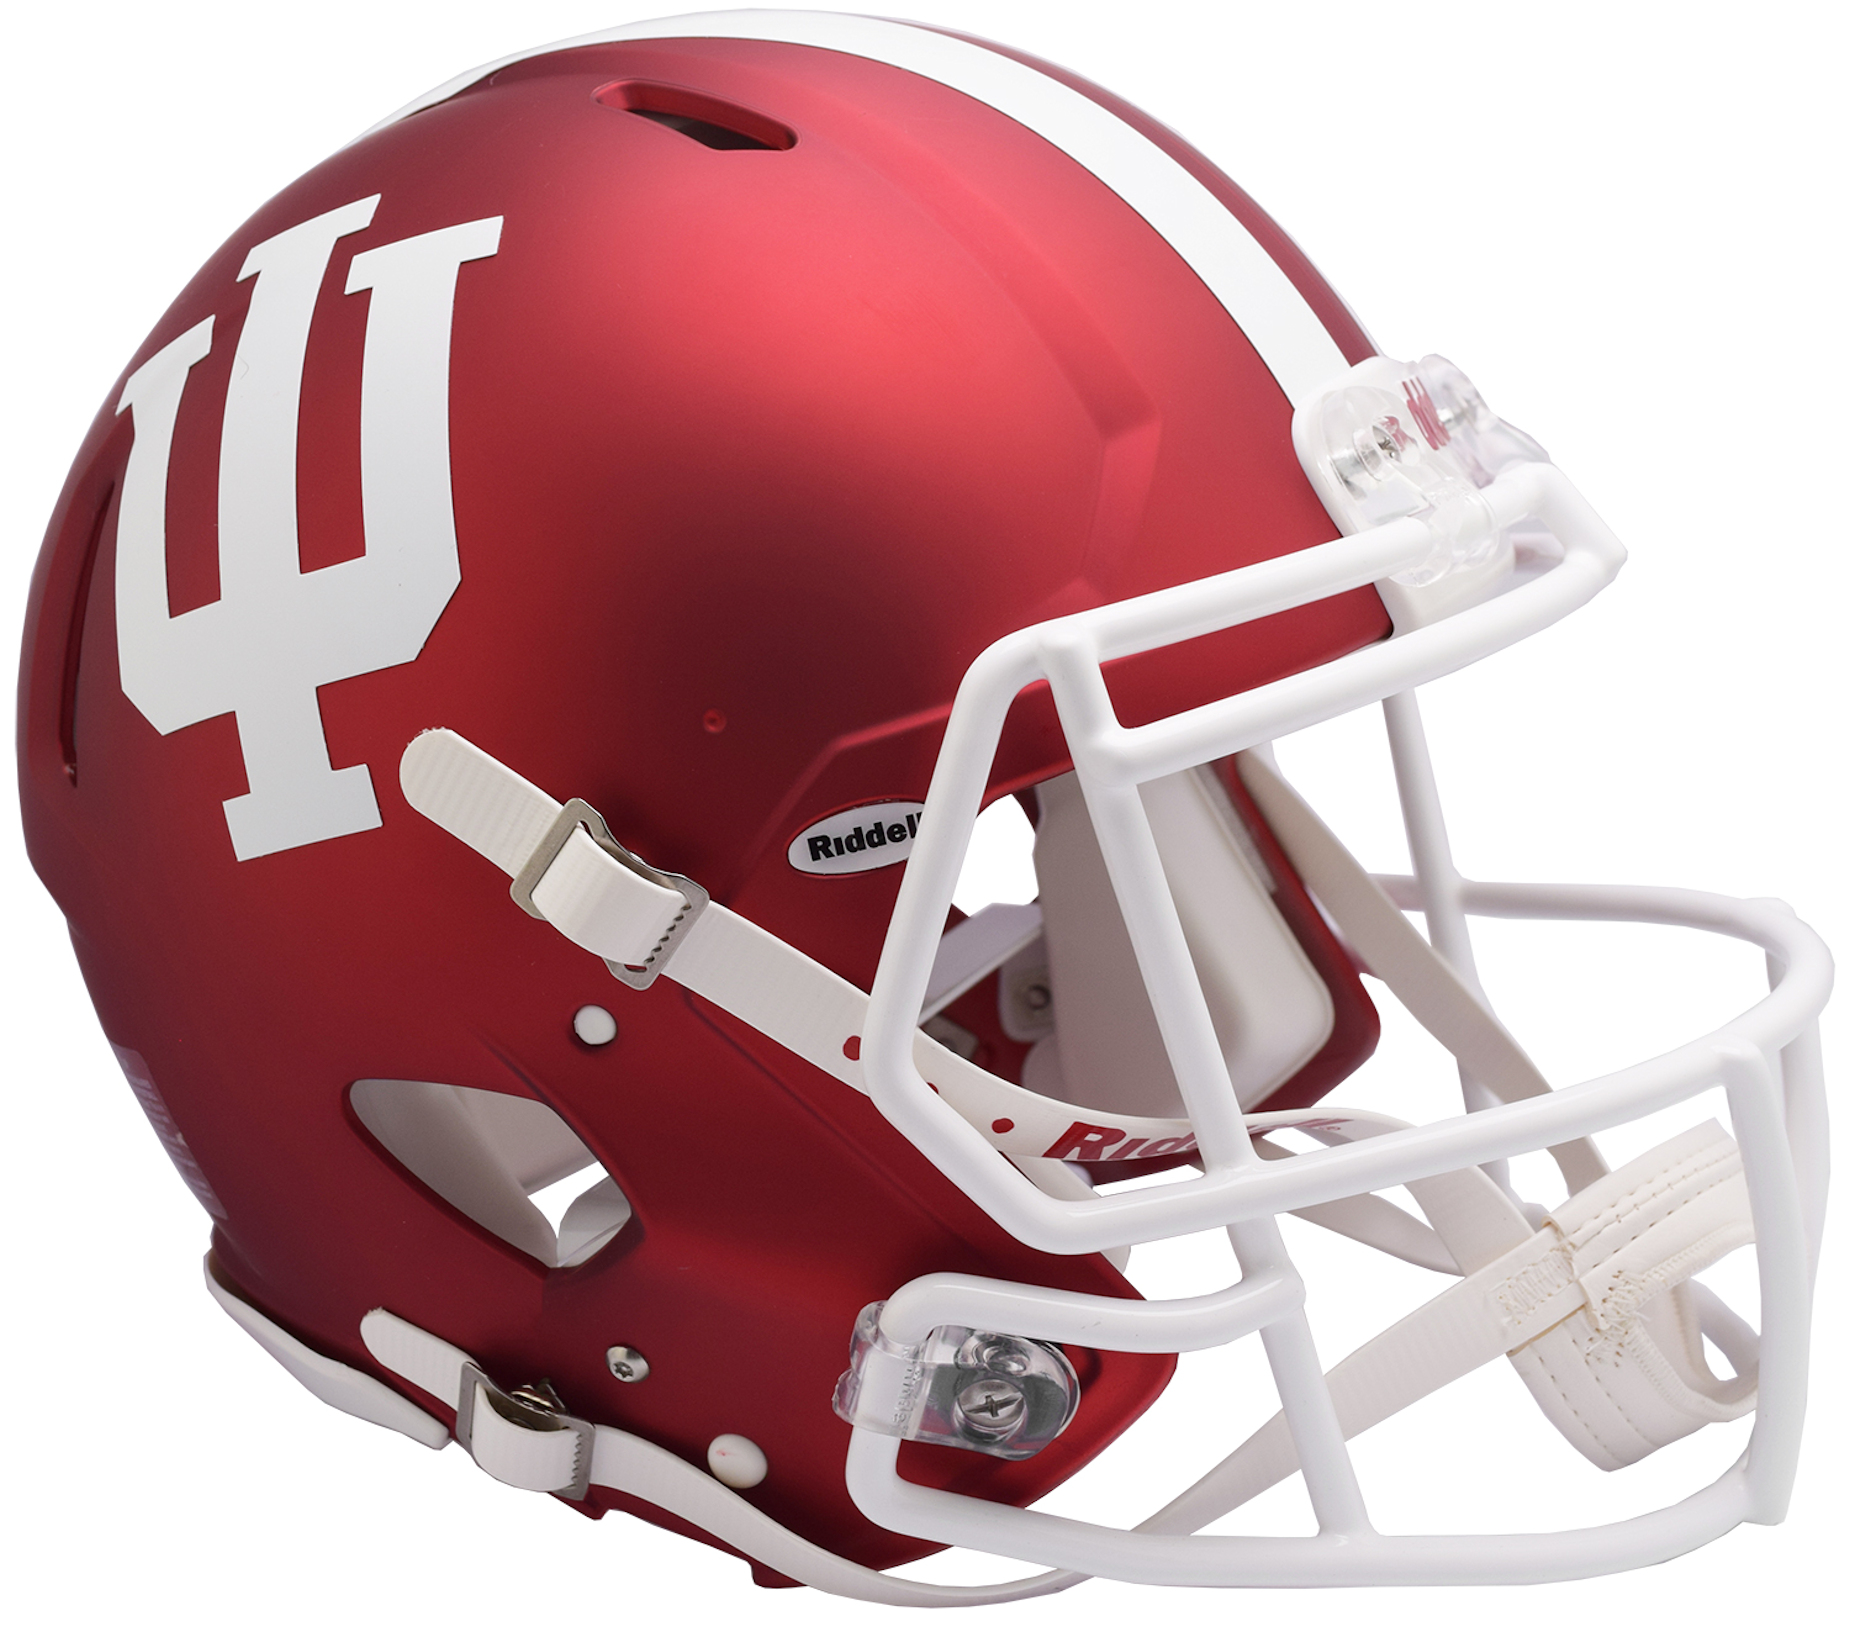 Indiana Hoosiers Speed Football Helmet <B>Anodized Crimson</B>